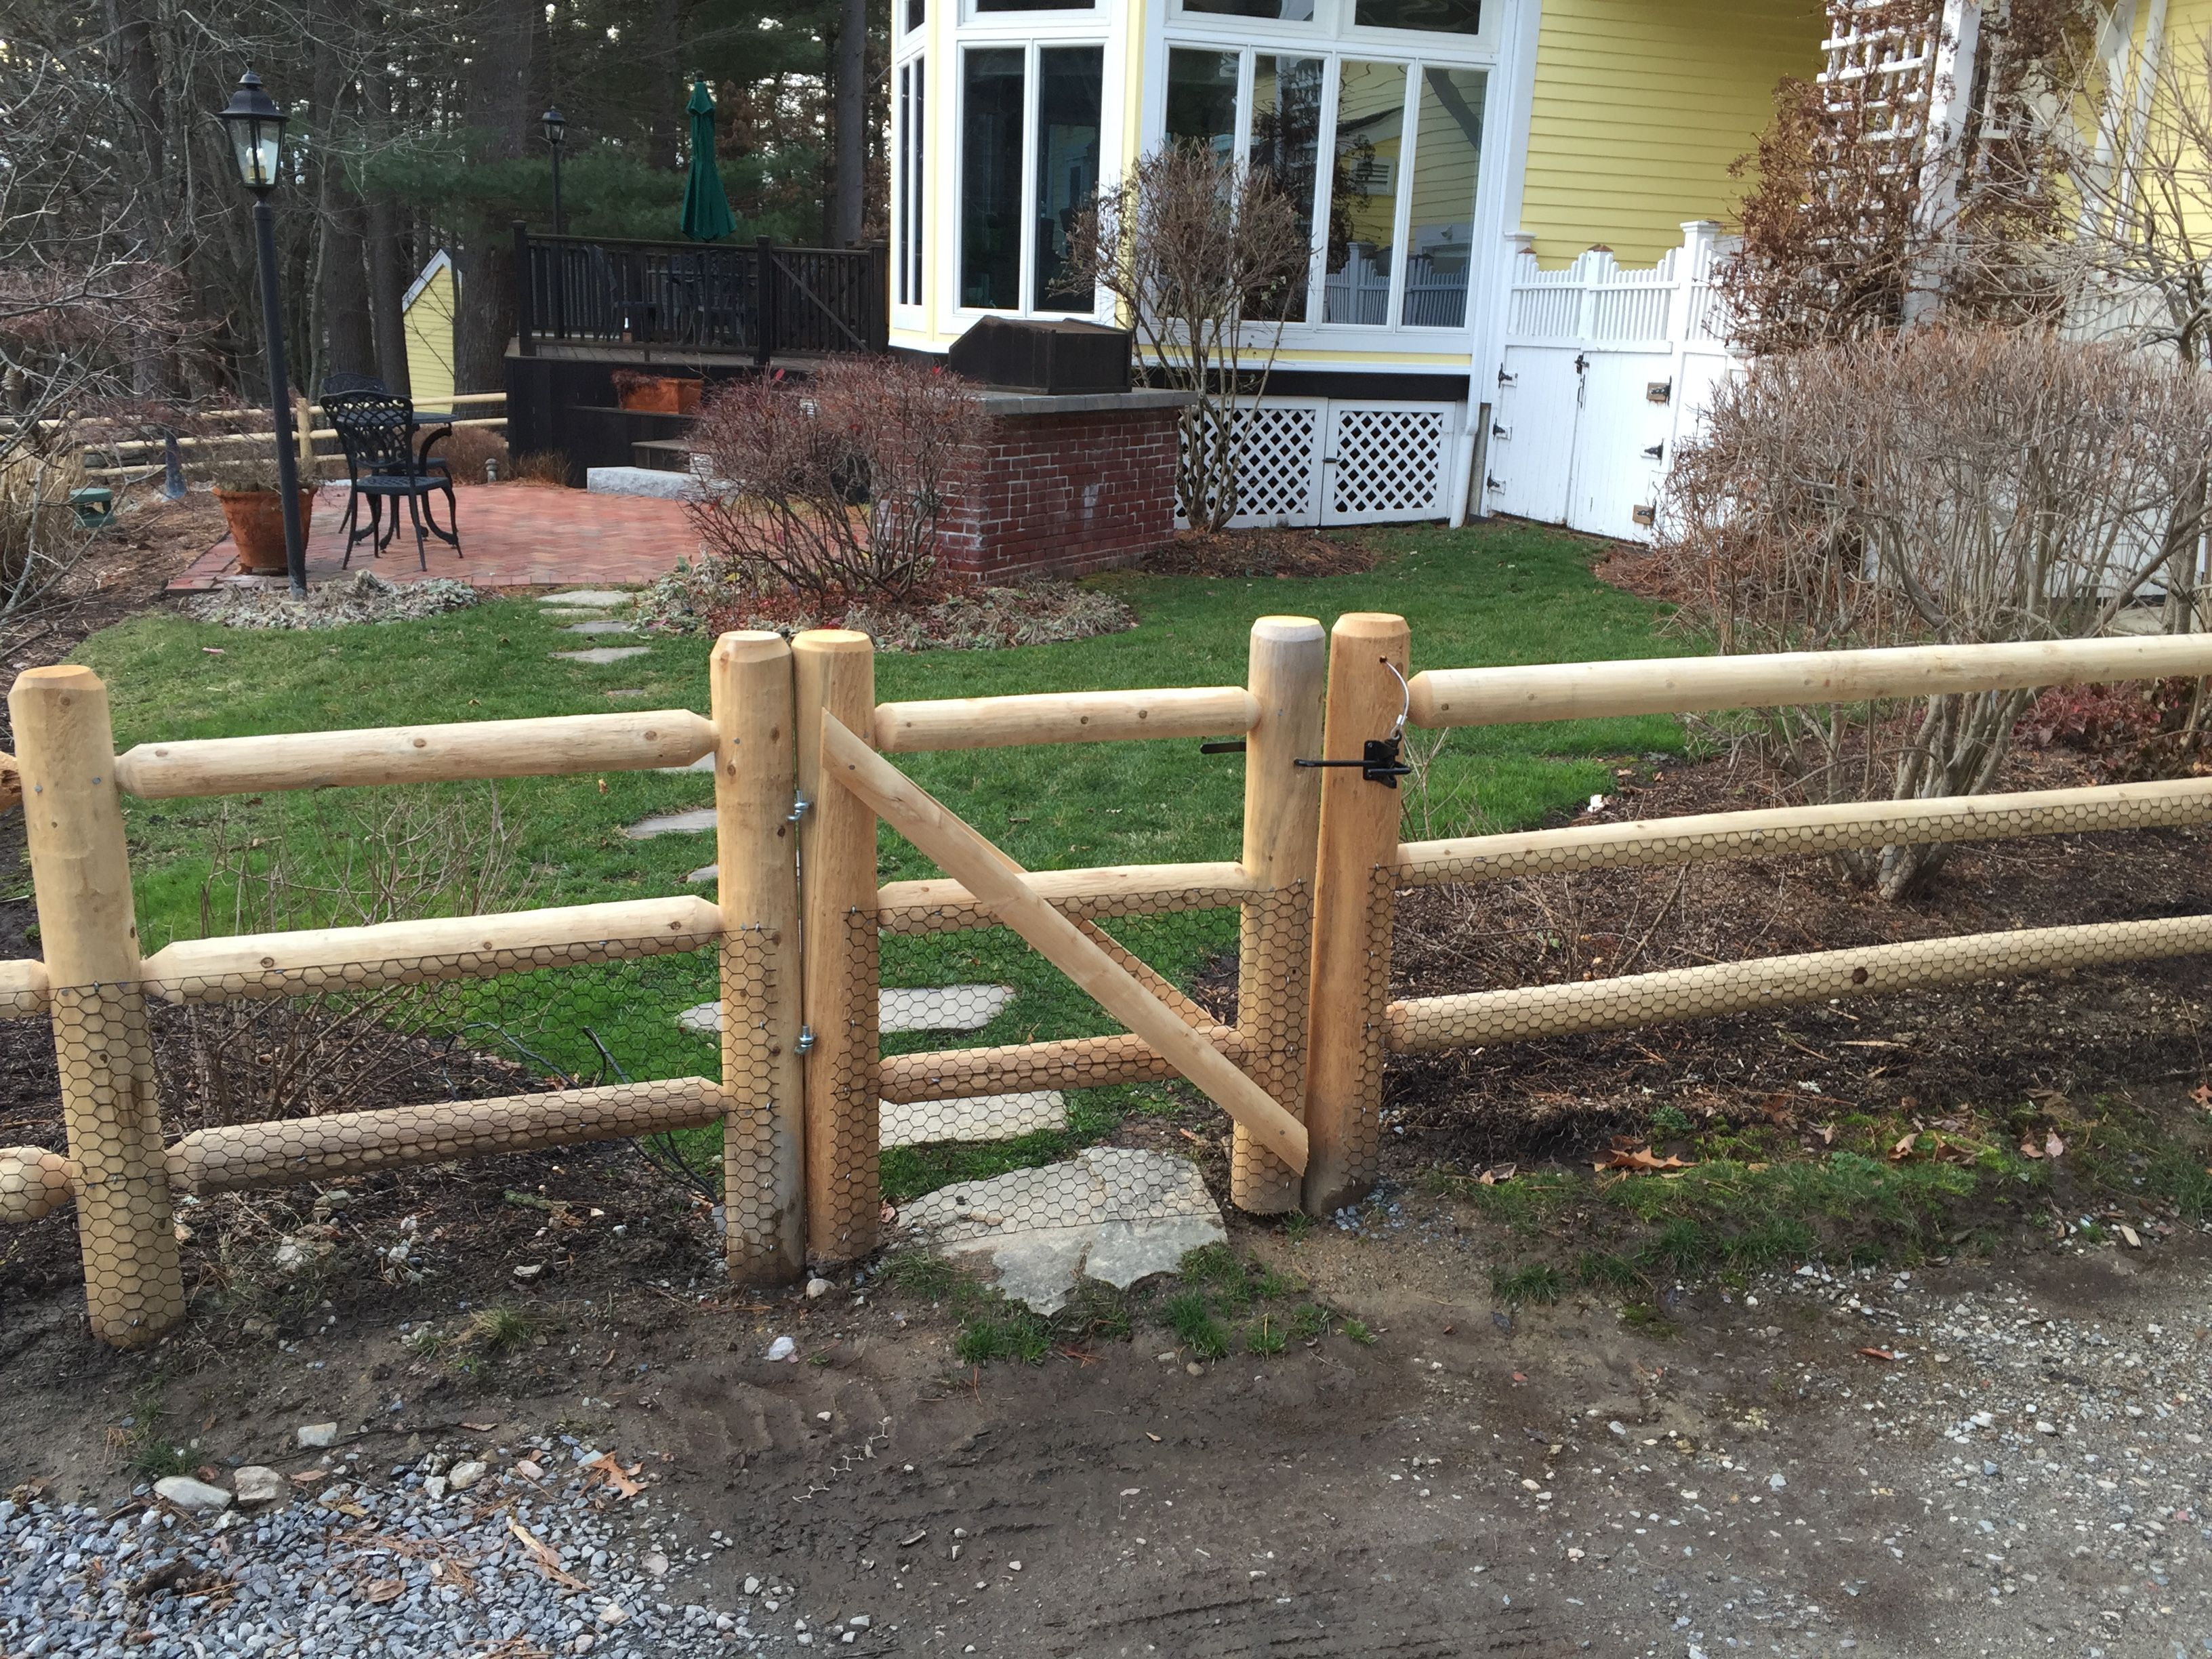 2 rail highlander fence round cedar posts round dowel rails